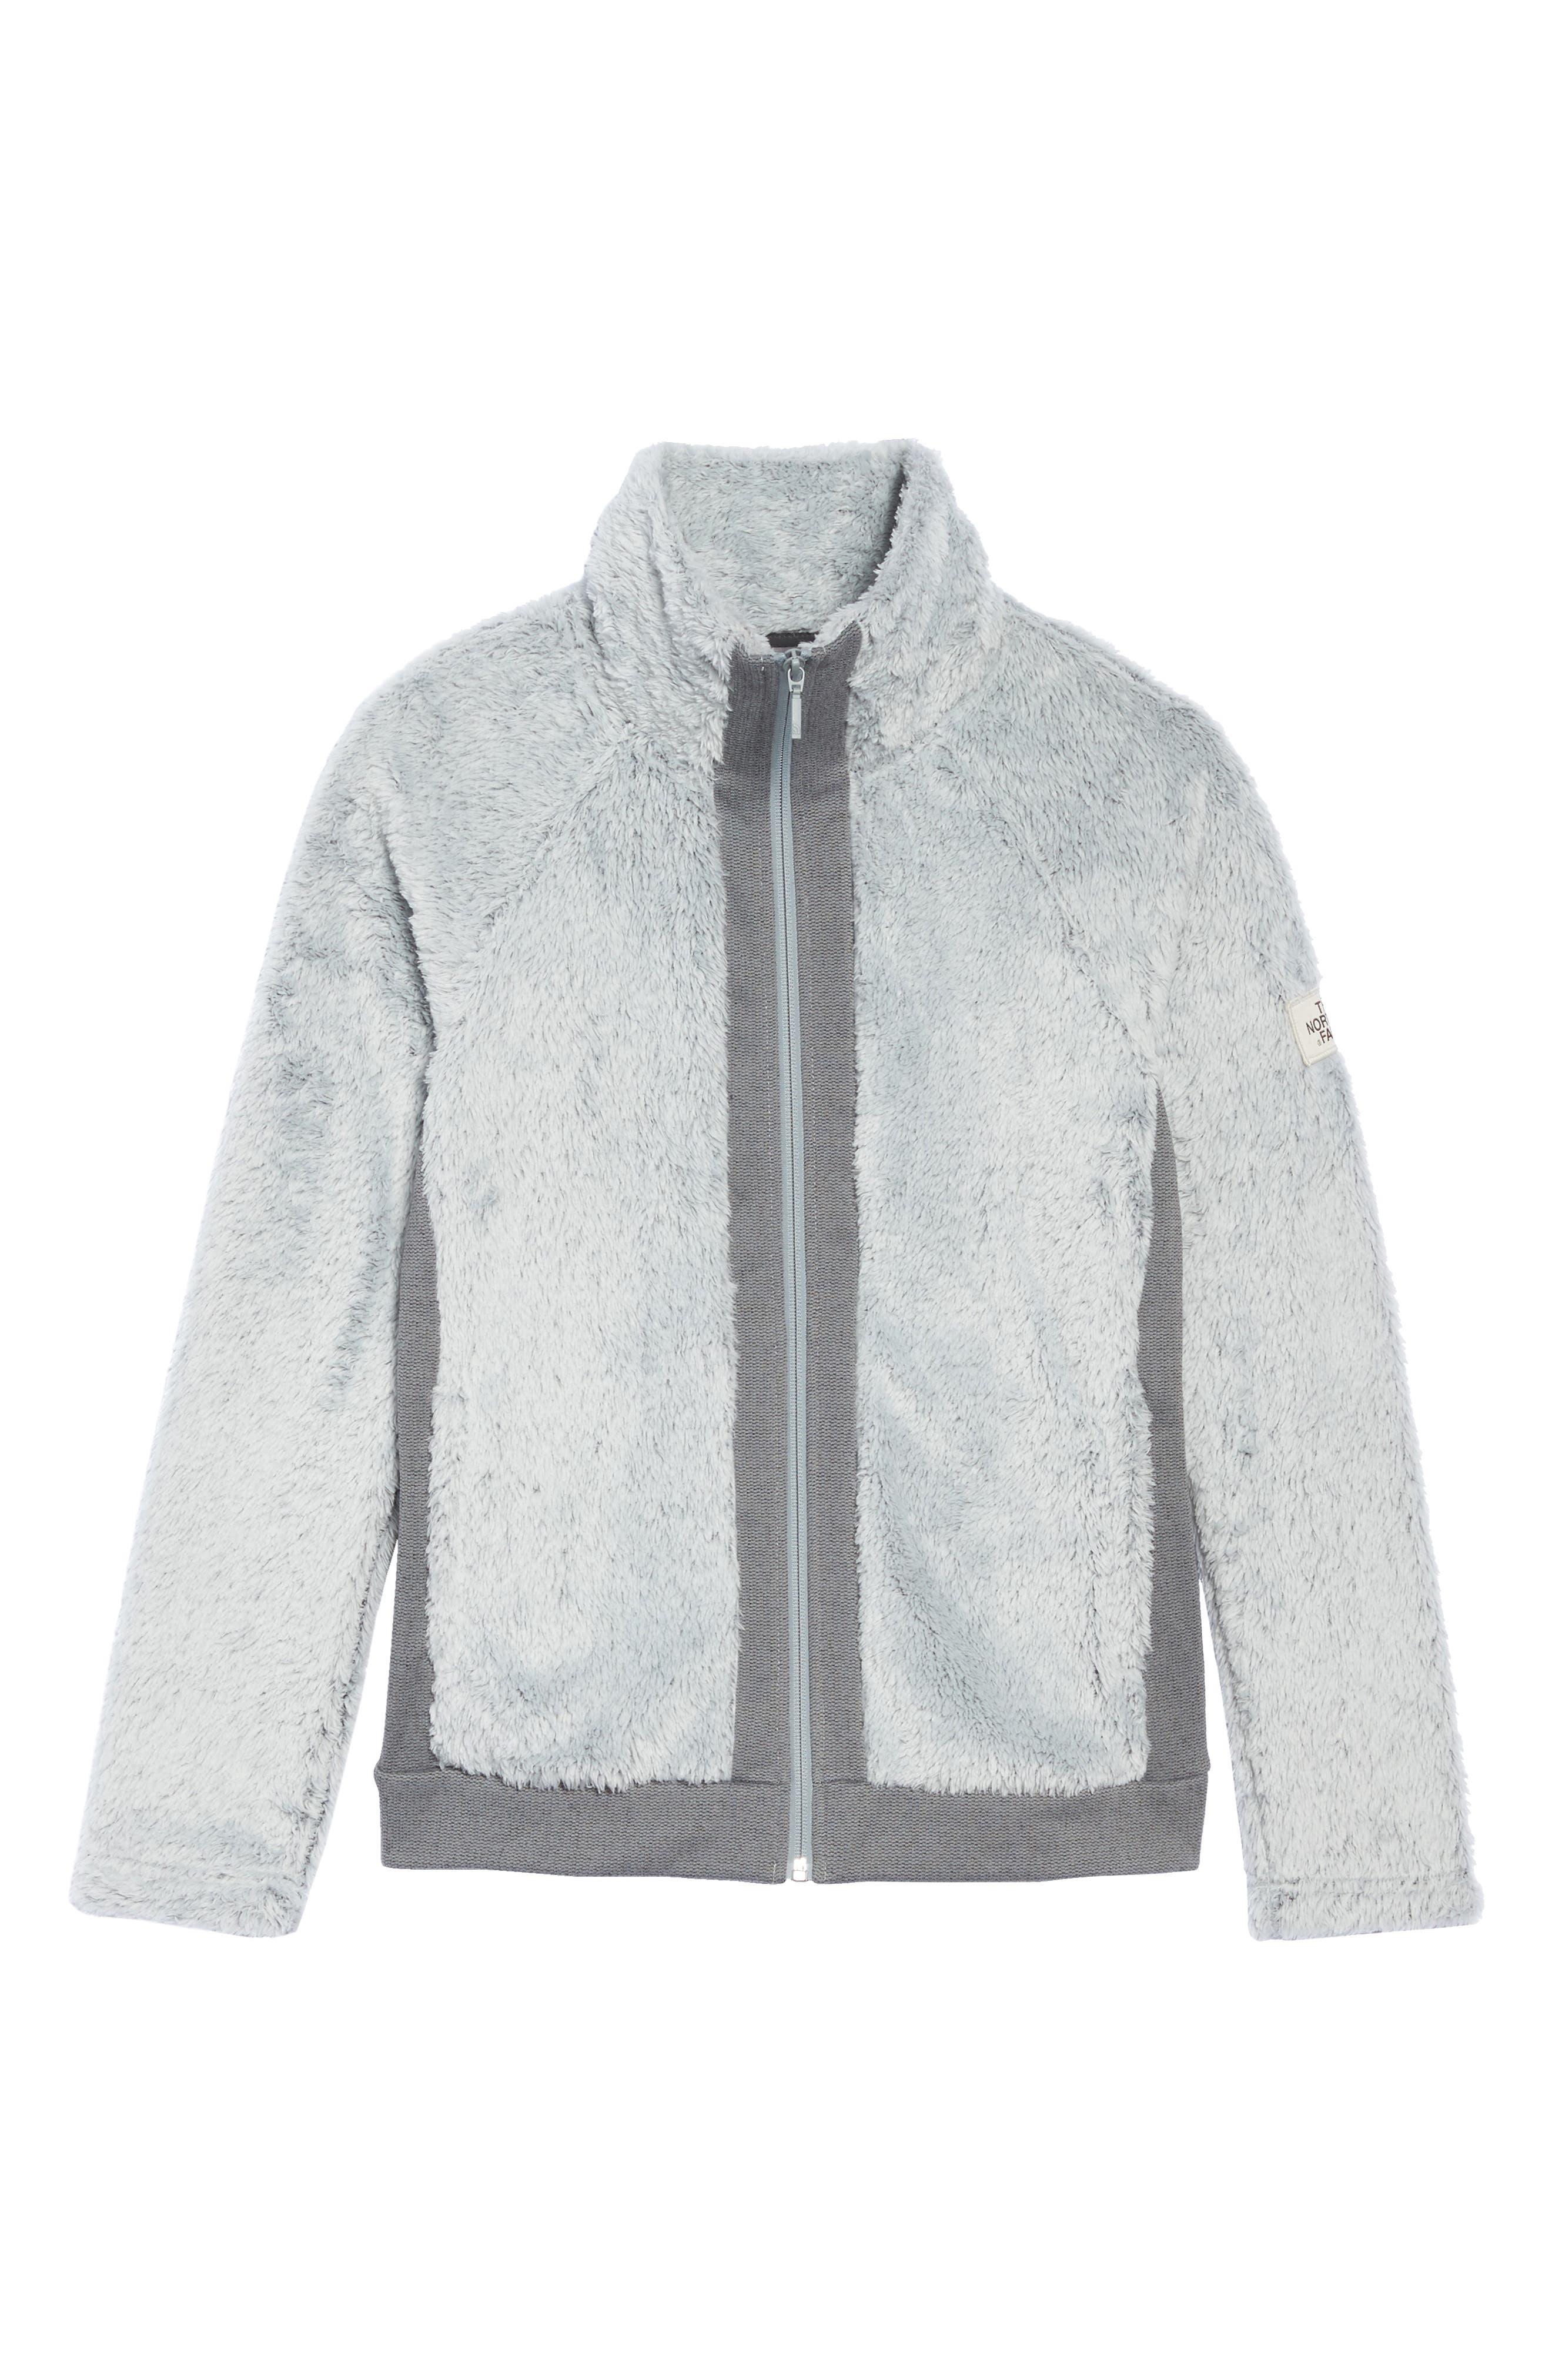 Furry Fleece Jacket,                             Alternate thumbnail 32, color,